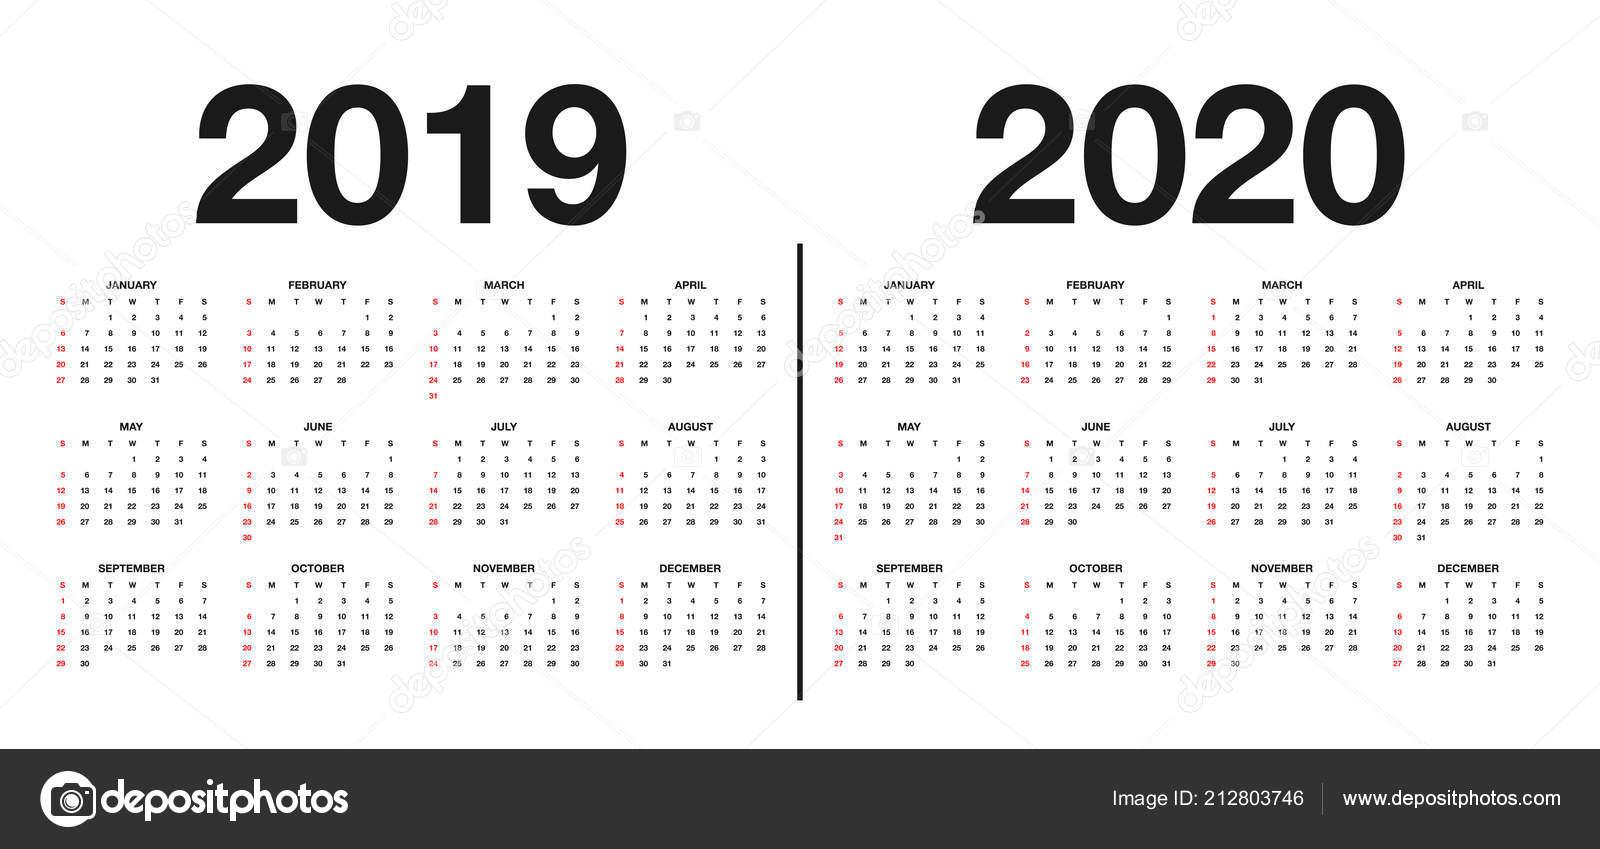 Шаблон Календаря 2020   Календарь 2019 2020 Шаблон Дизайн Календаря throughout Calendar 2019 2020 With Boxes